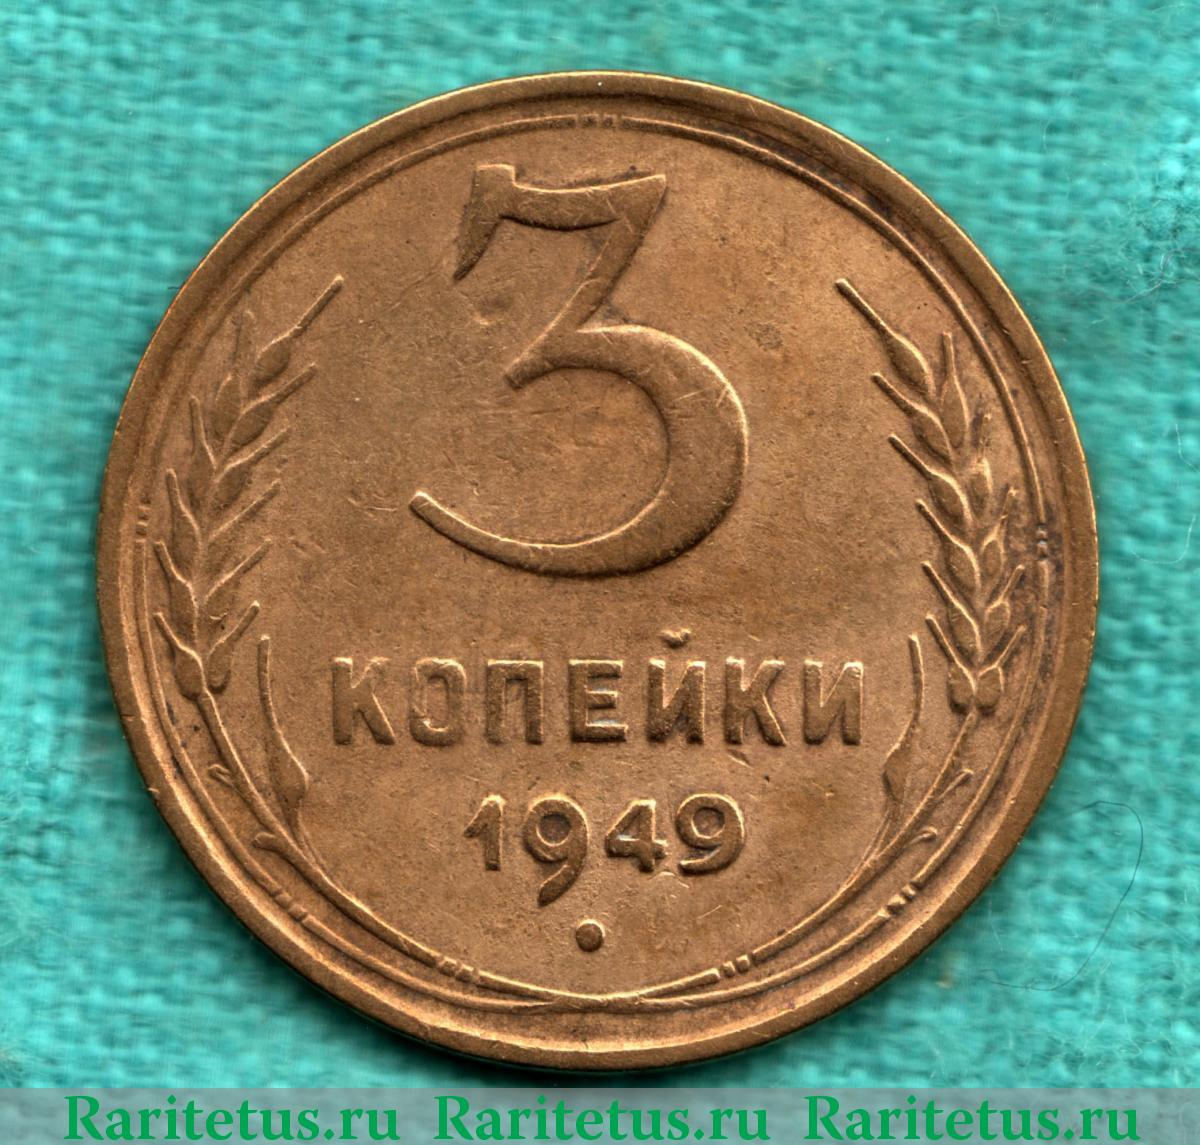 25 коп 2007г цена украина